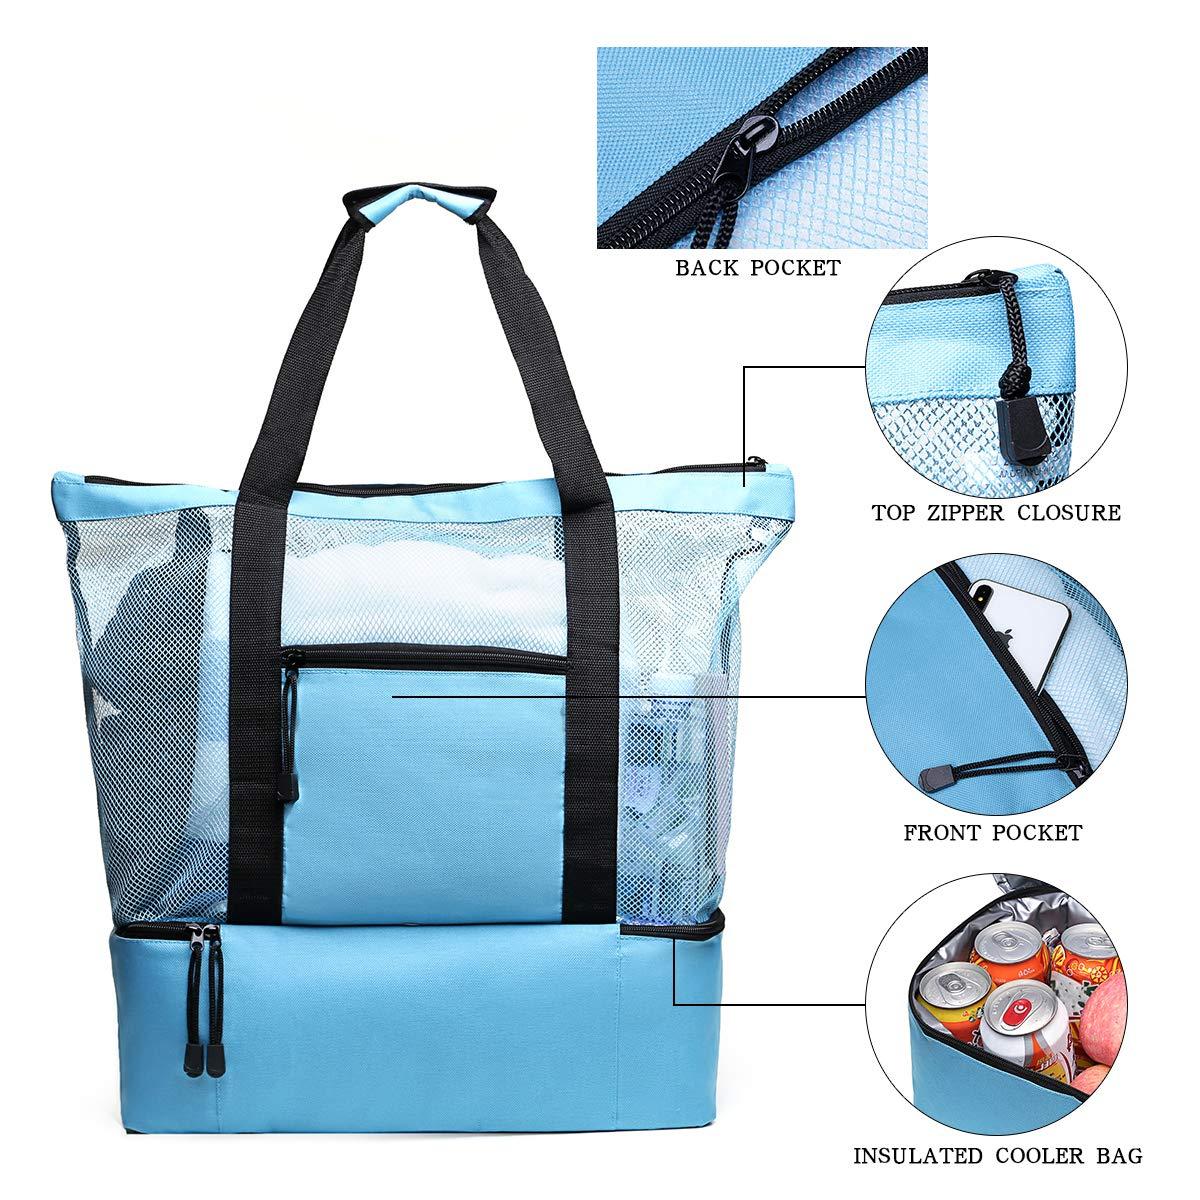 Tang Xiao Bang Beach Tote Mesh Beach Bags Insulated Picnic Cooler Pool Bag with Zipper Top for Women (Sky Blue)